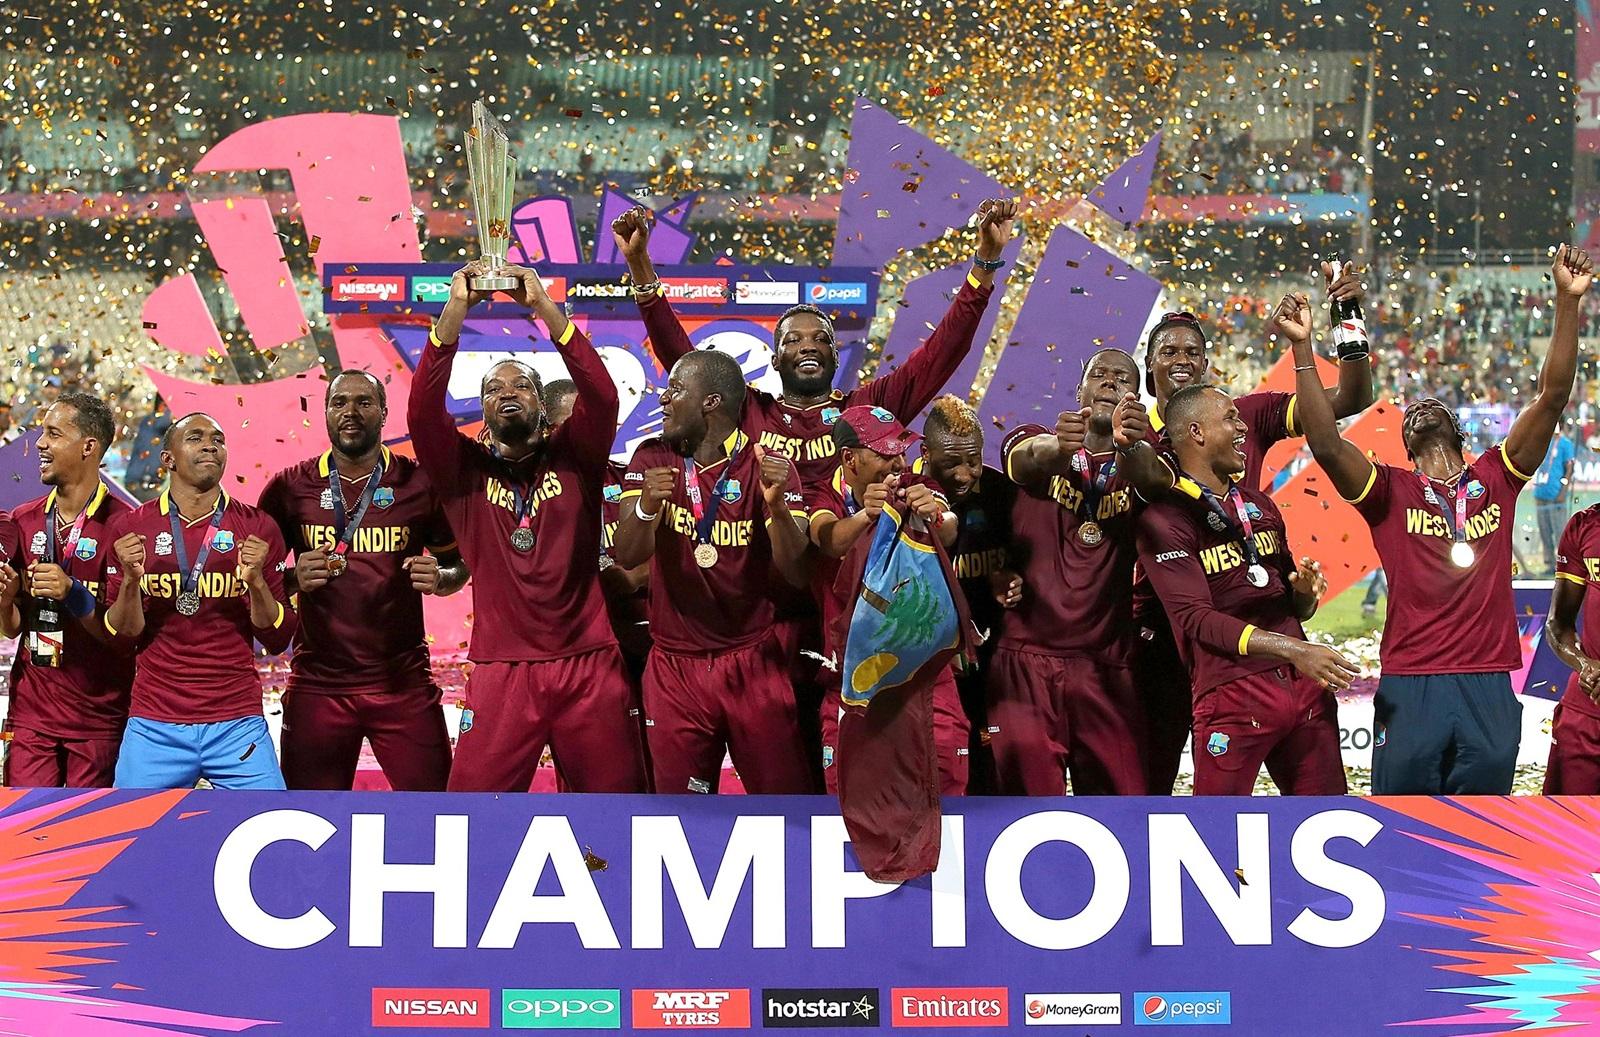 ICC considering 'bio-bubbles' for T20 World Cup | cricket.com.au